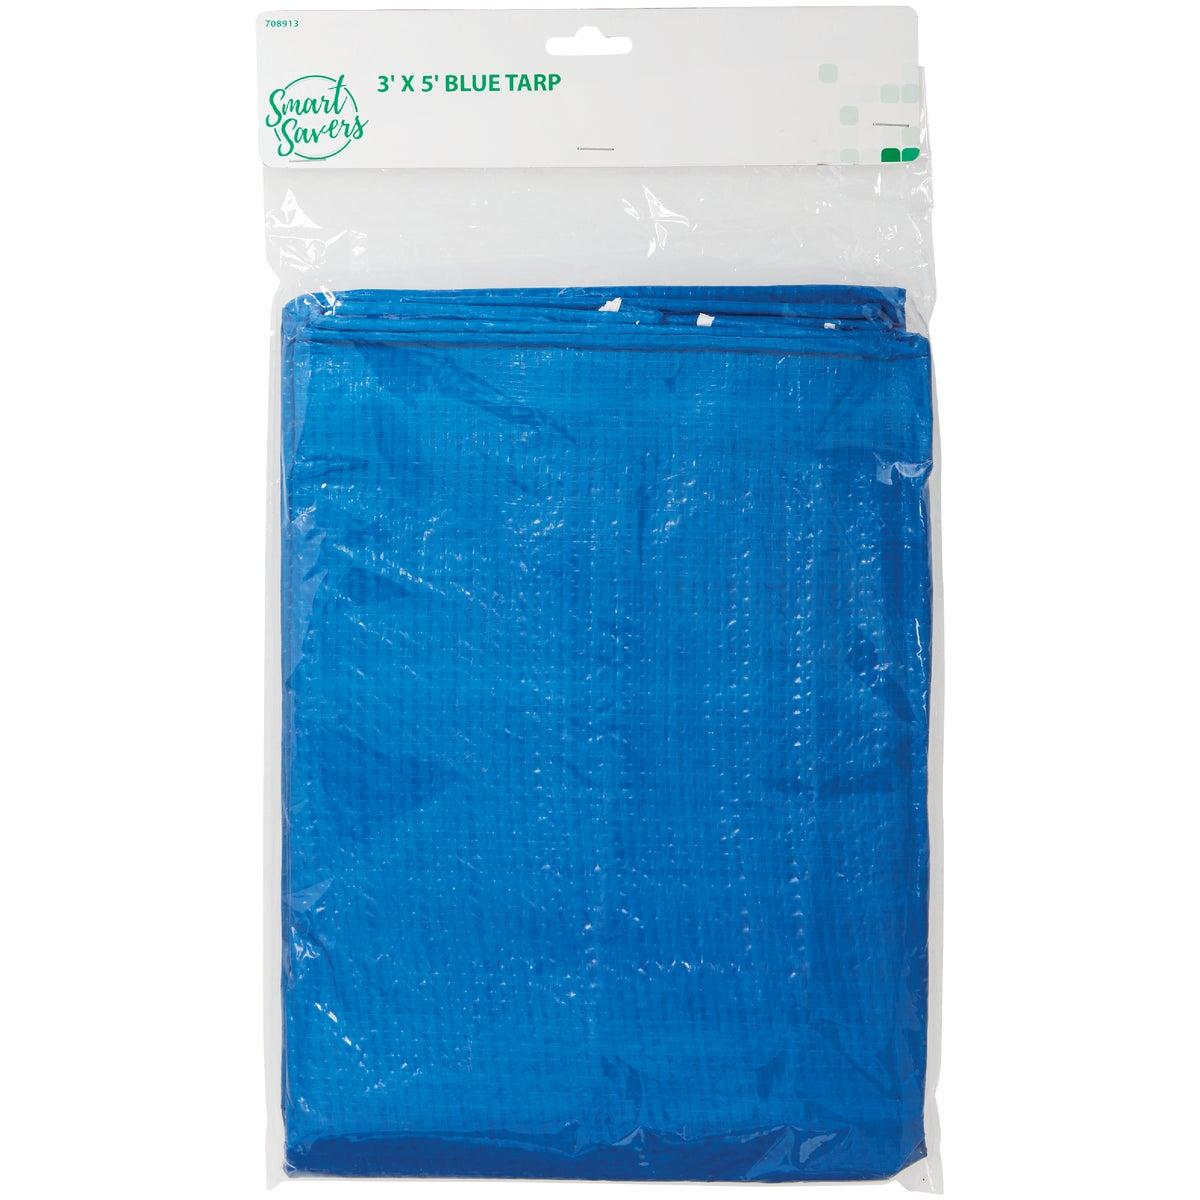 3X5 BLUE TARP